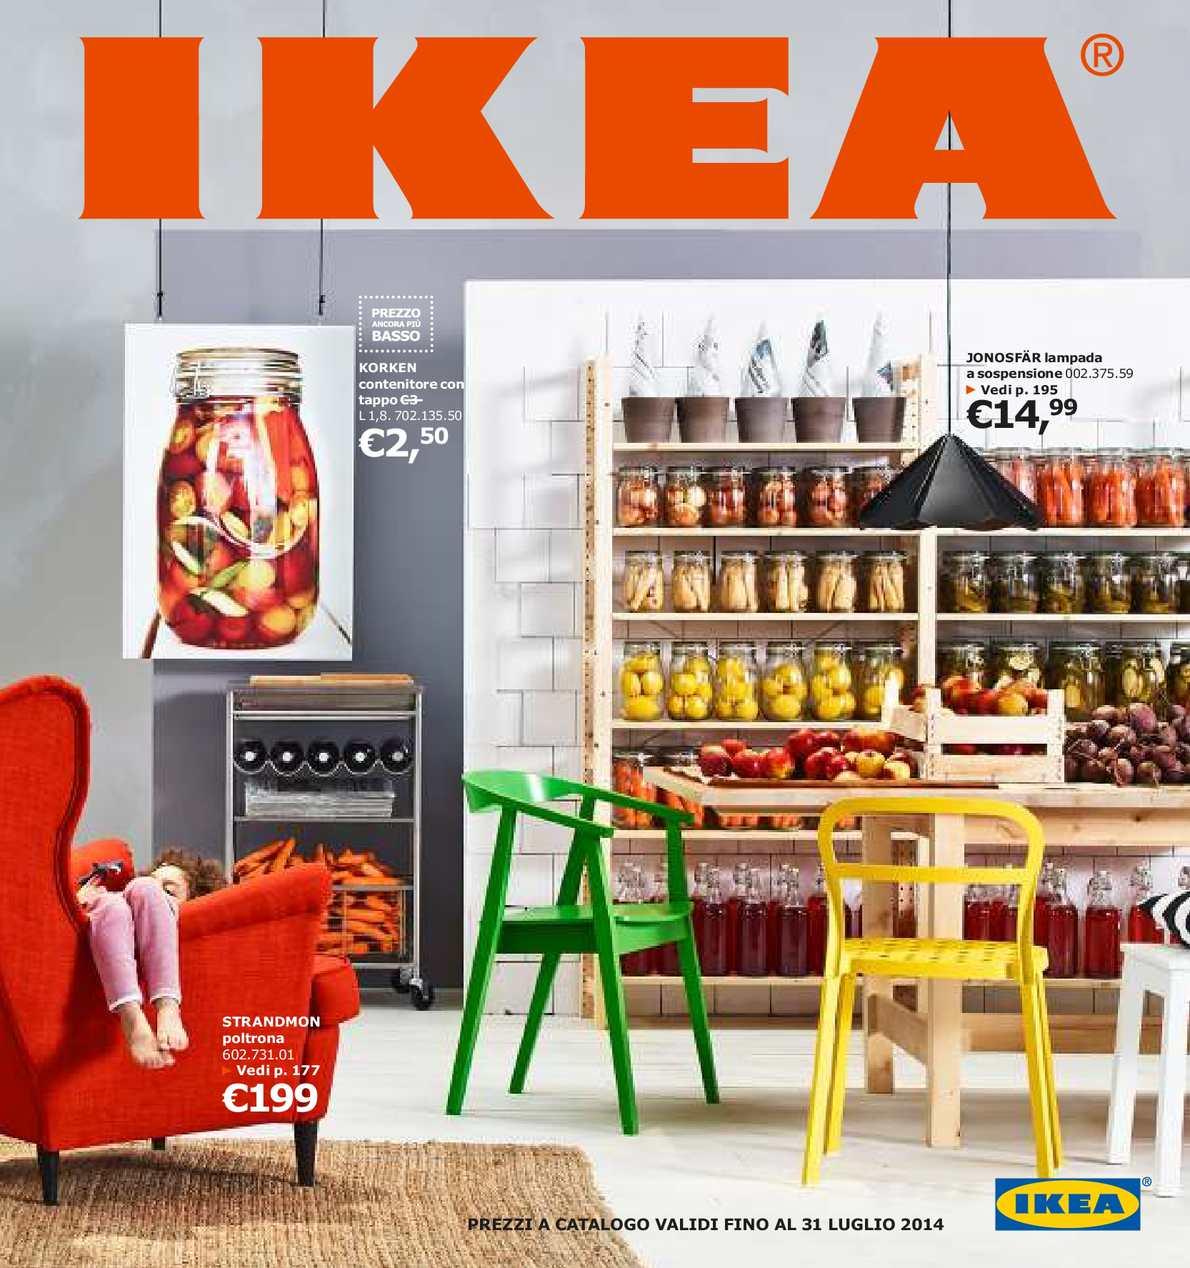 Ikea customer service center (vedi p 309)